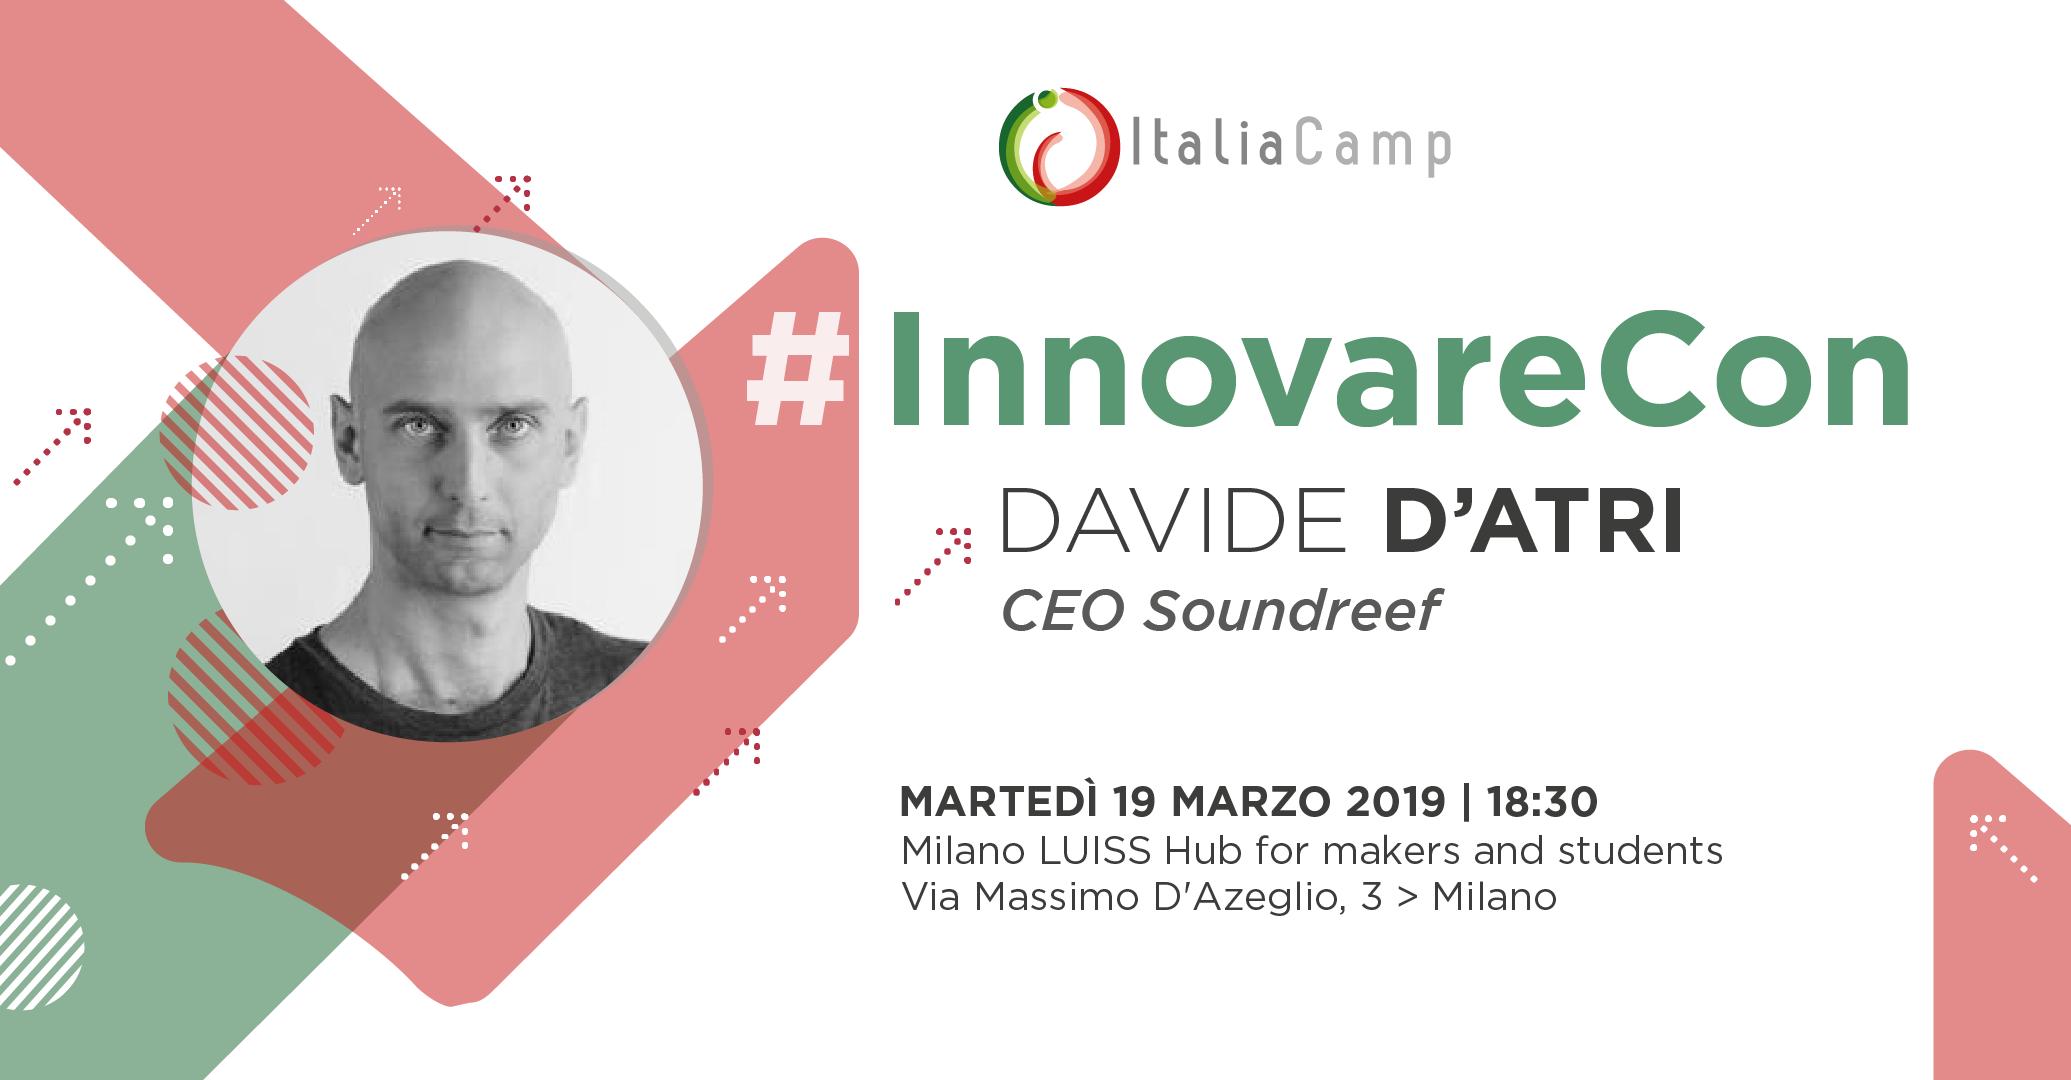 #InnovareCon Davide D'Atri al Milano LUISS Hub